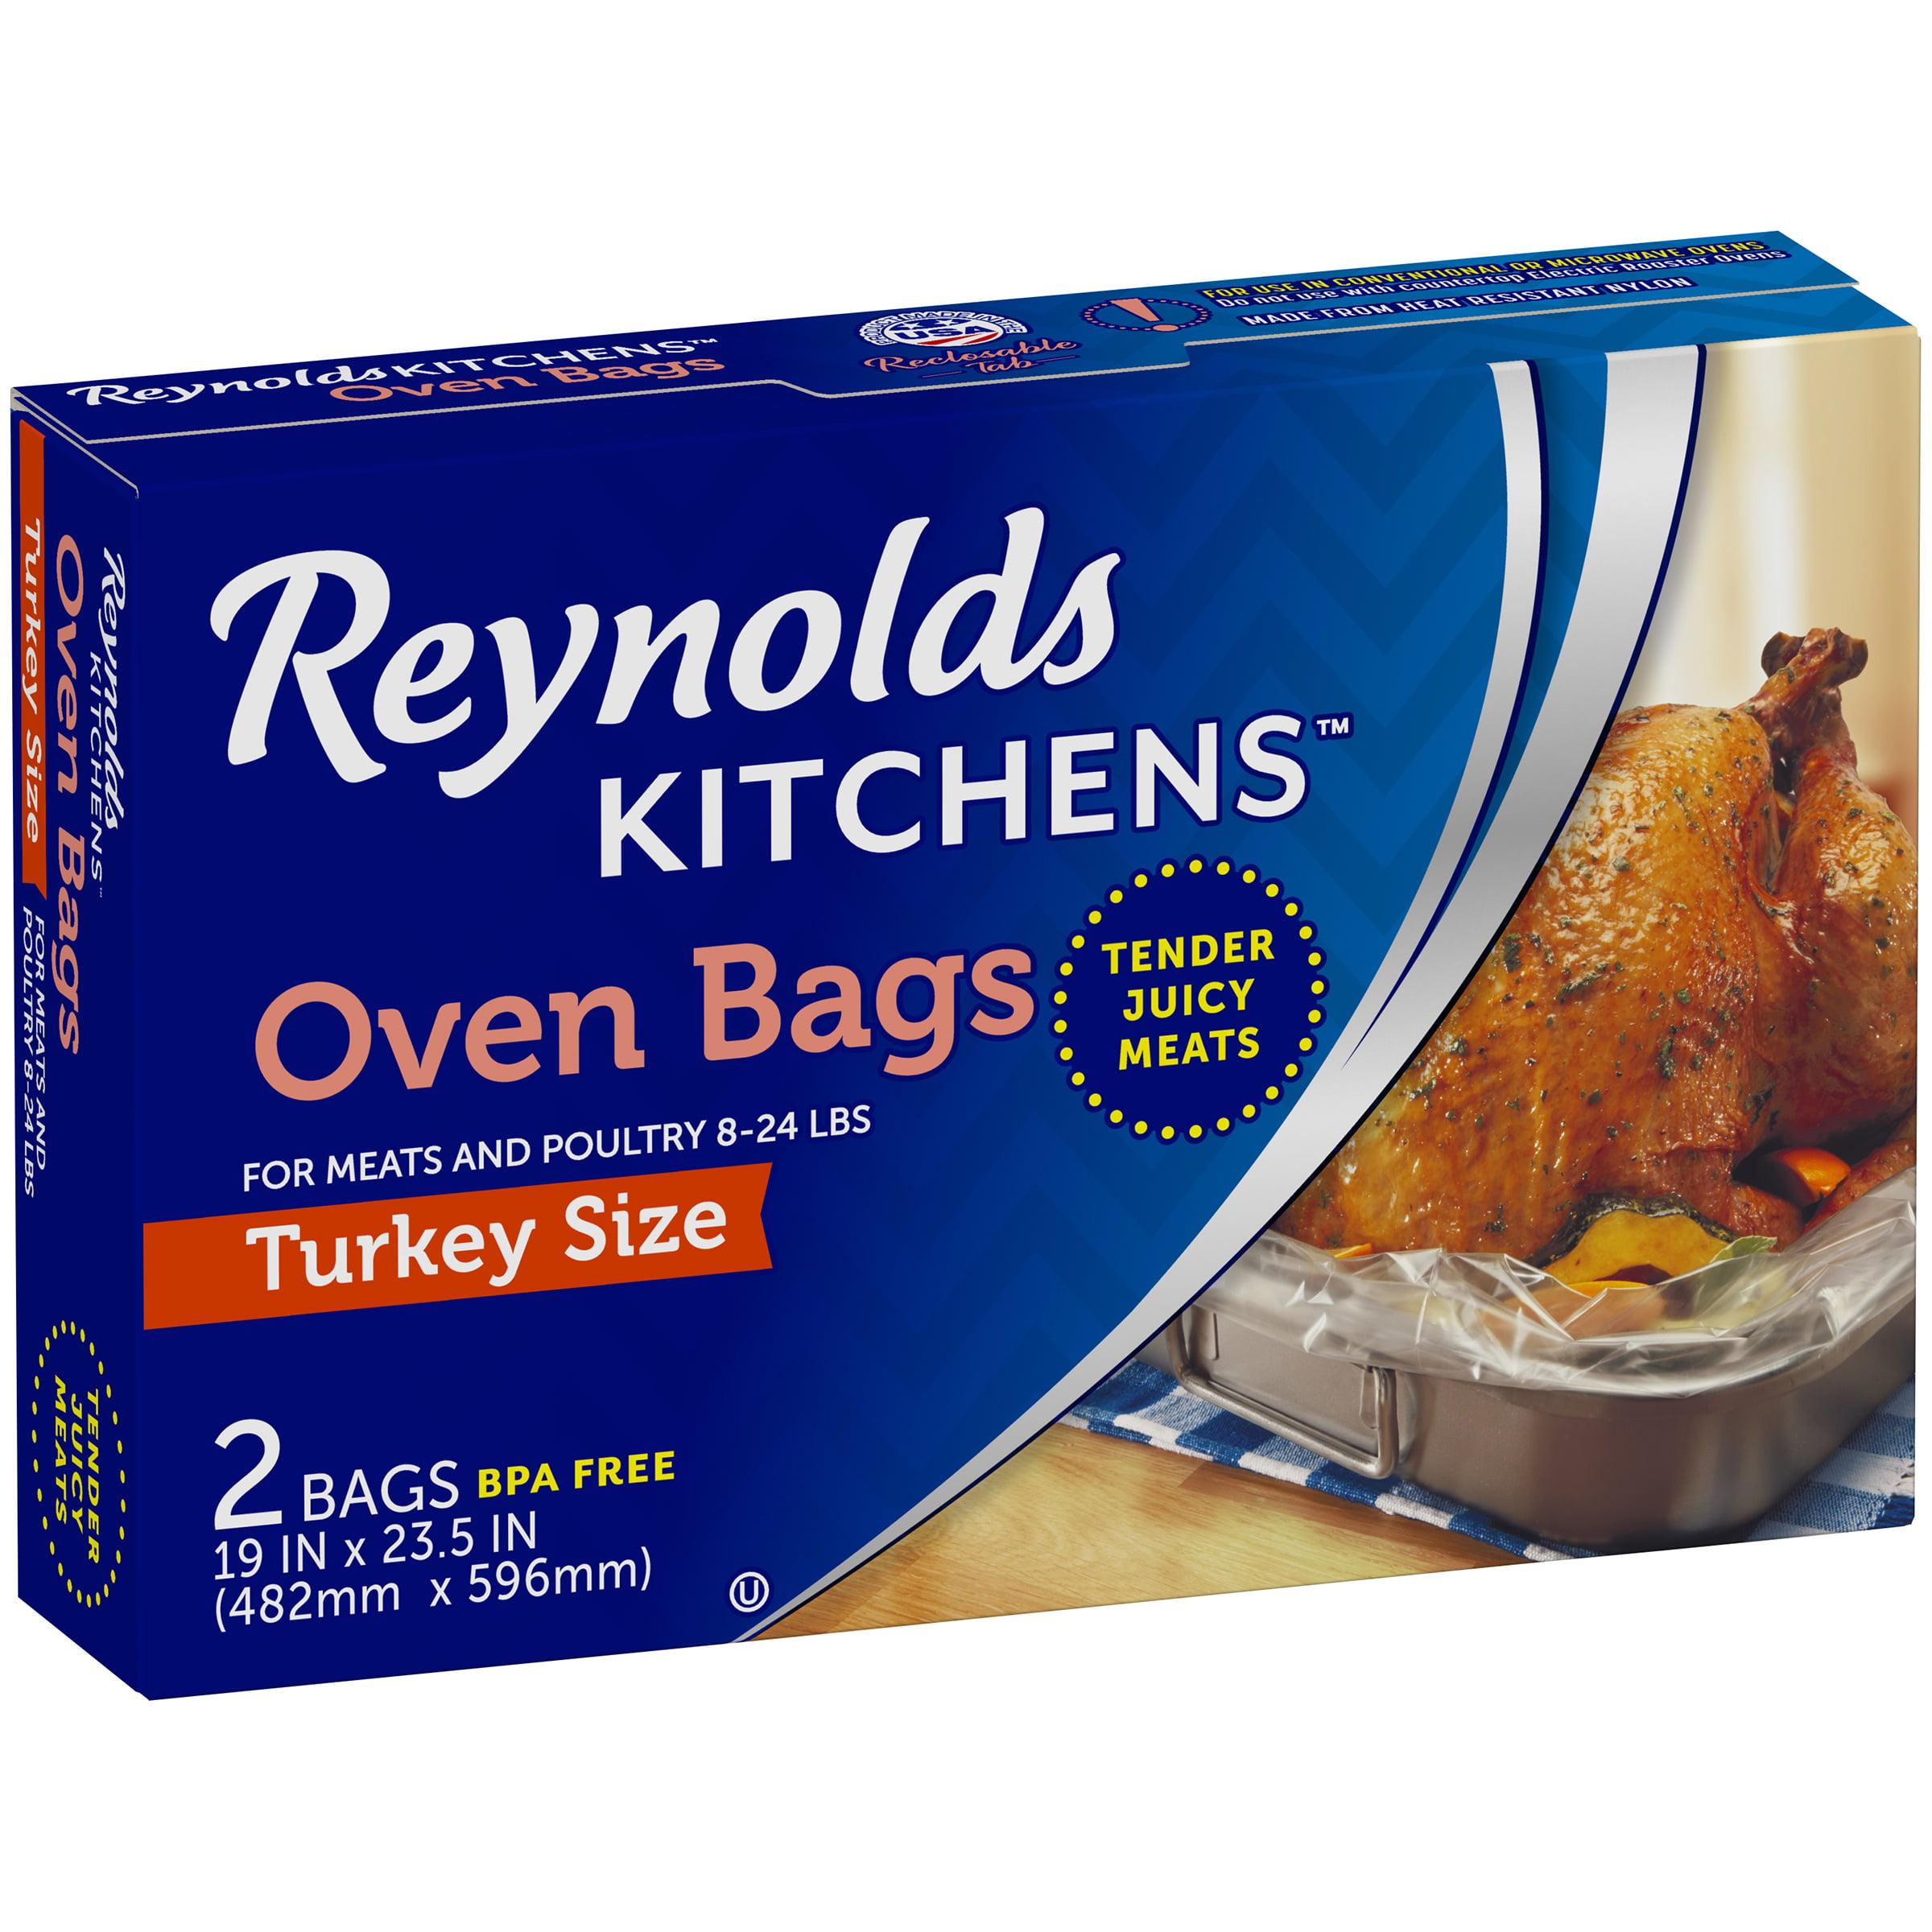 Reynolds Kitchens Turkey Size Oven Bags 2 Ct Box Walmart